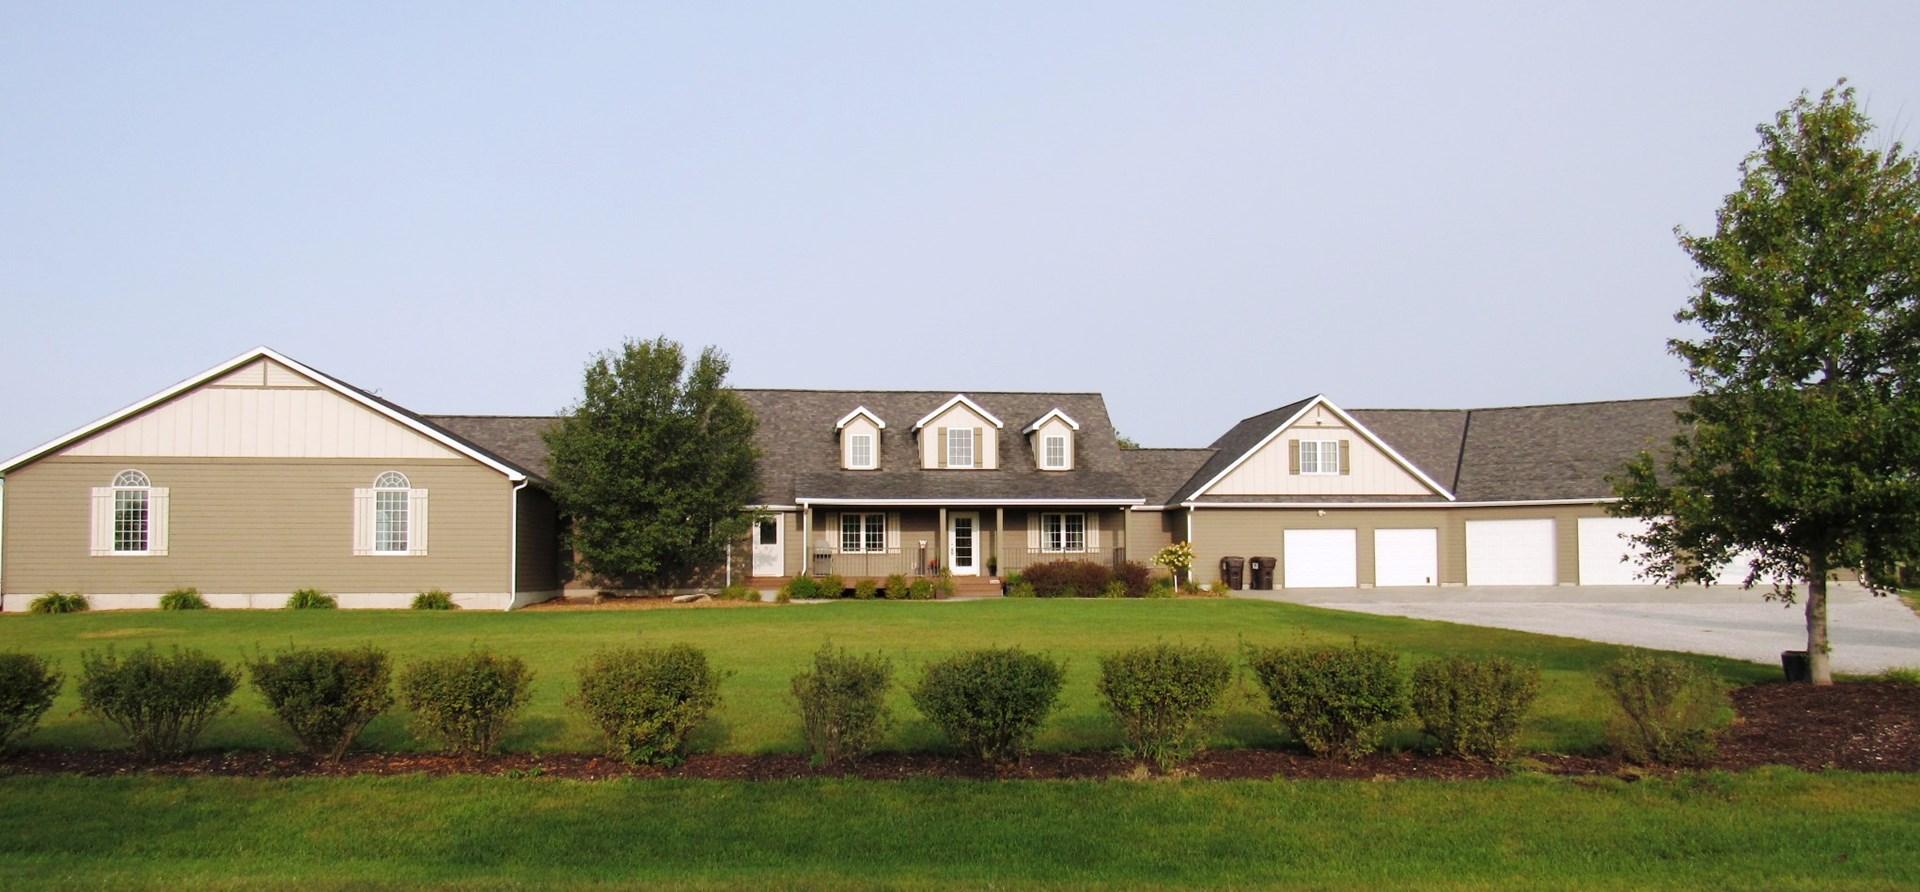 Lancaster County Acreage For Sale